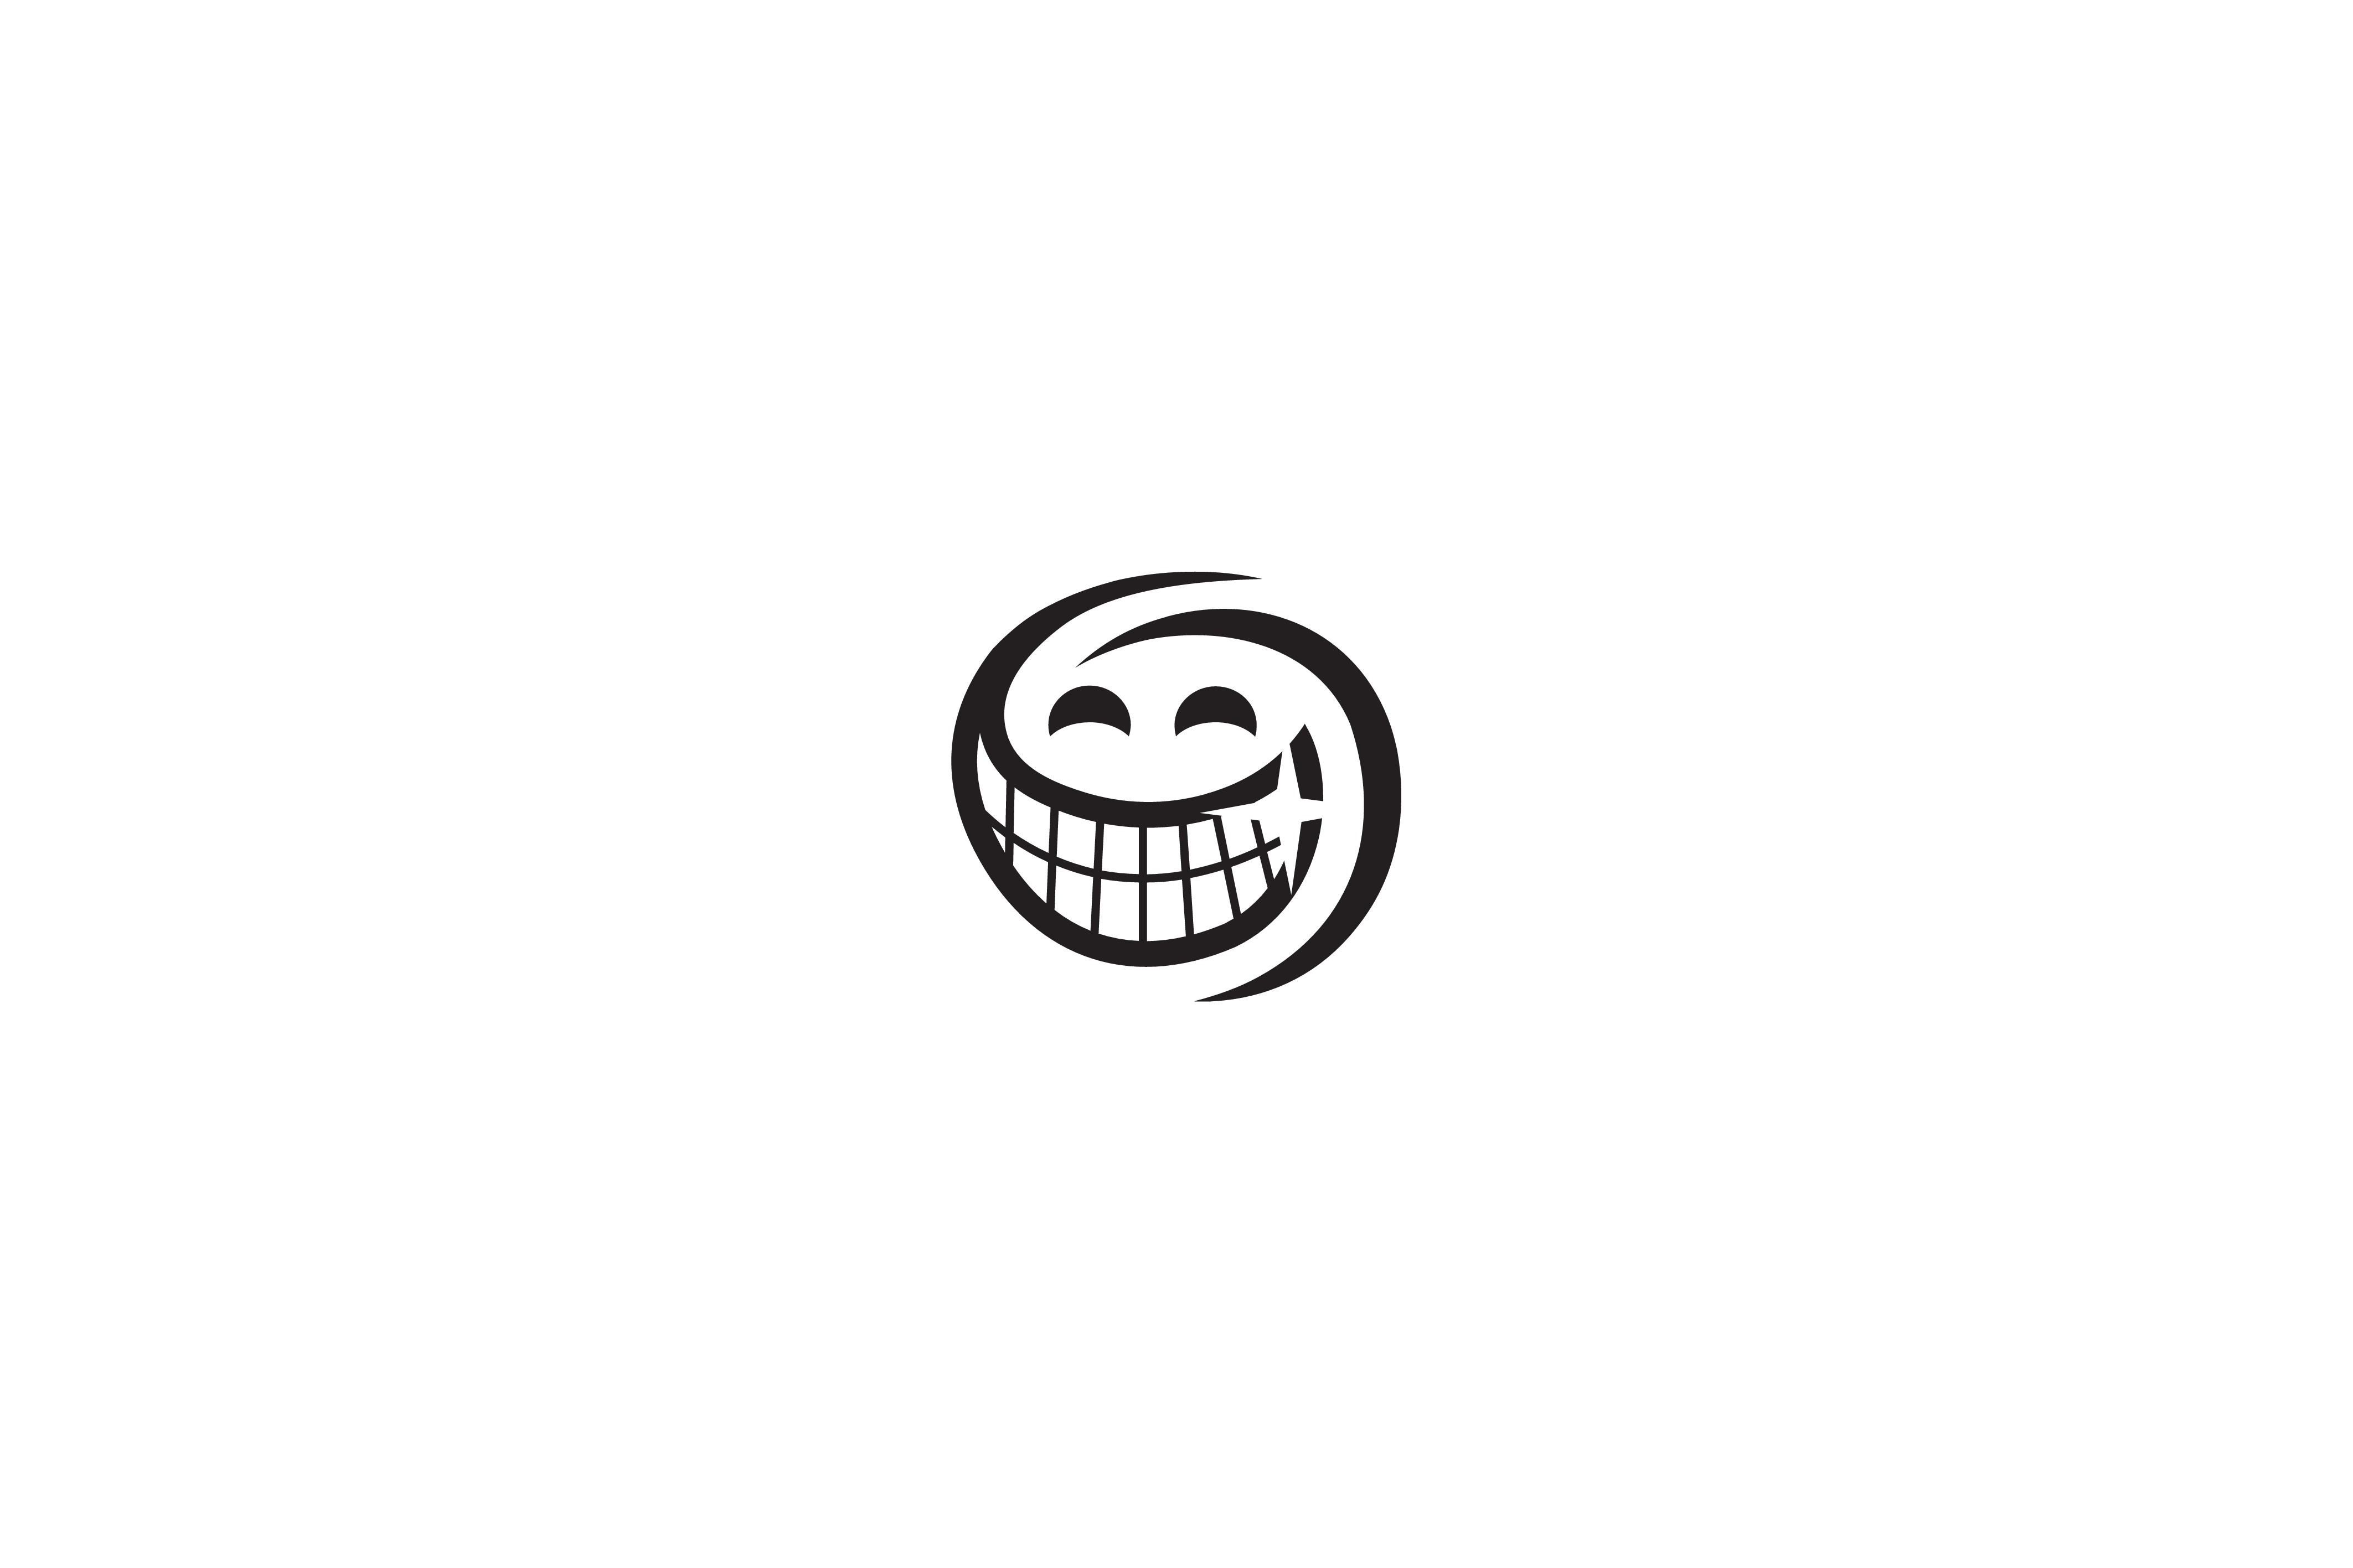 FunkkOFF!™ TeethRefreshers™  kick ass logo design!